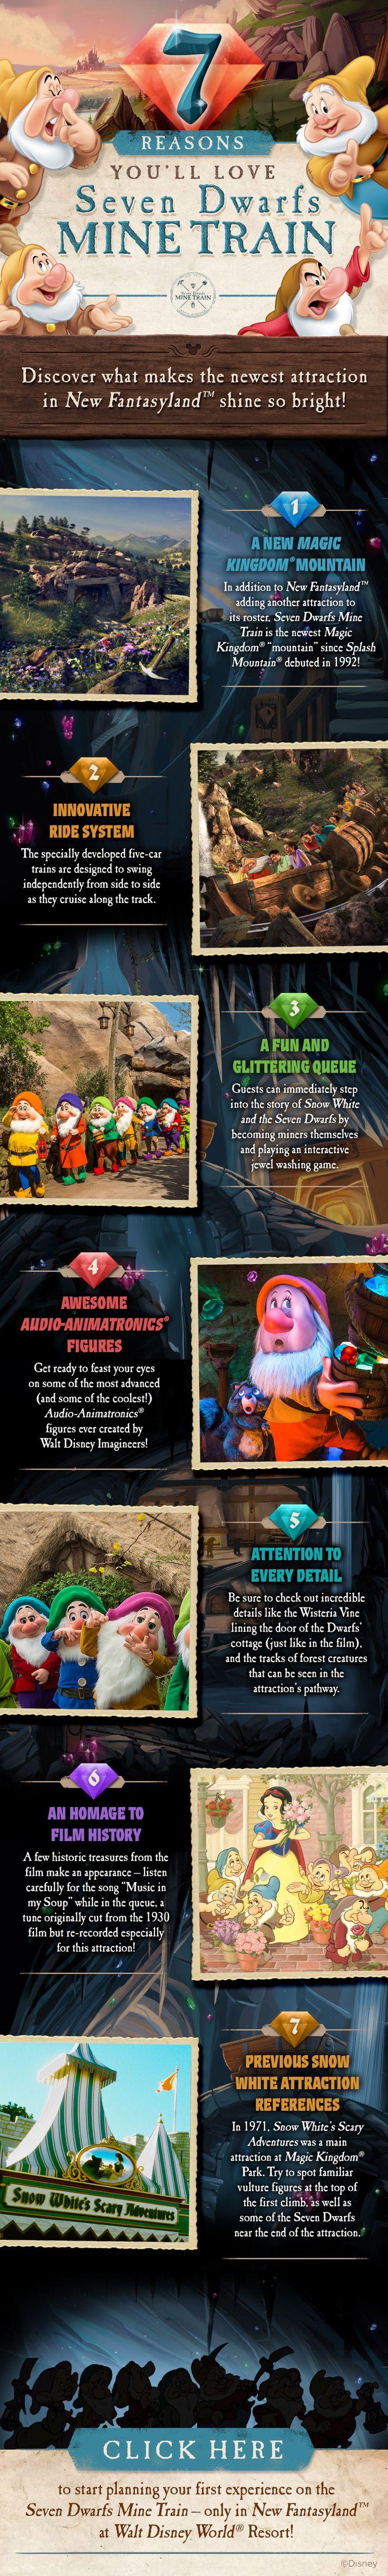 7 reasons you'll love Seven Dwarfs Mine Train! #vacation #tips #tricks #SnowWhite